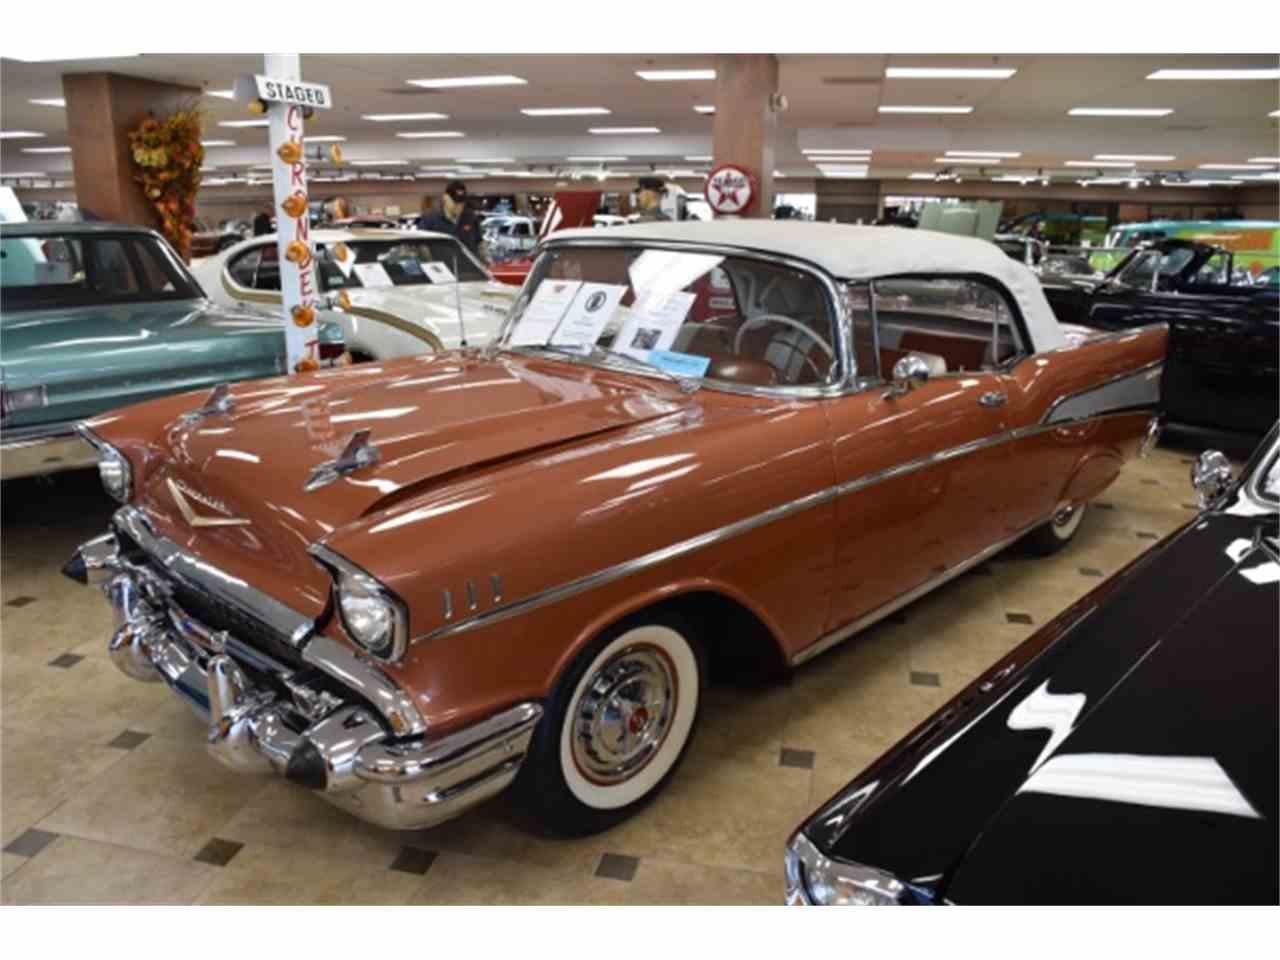 1957 Chevrolet Bel Air for Sale | ClassicCars.com | CC-914899